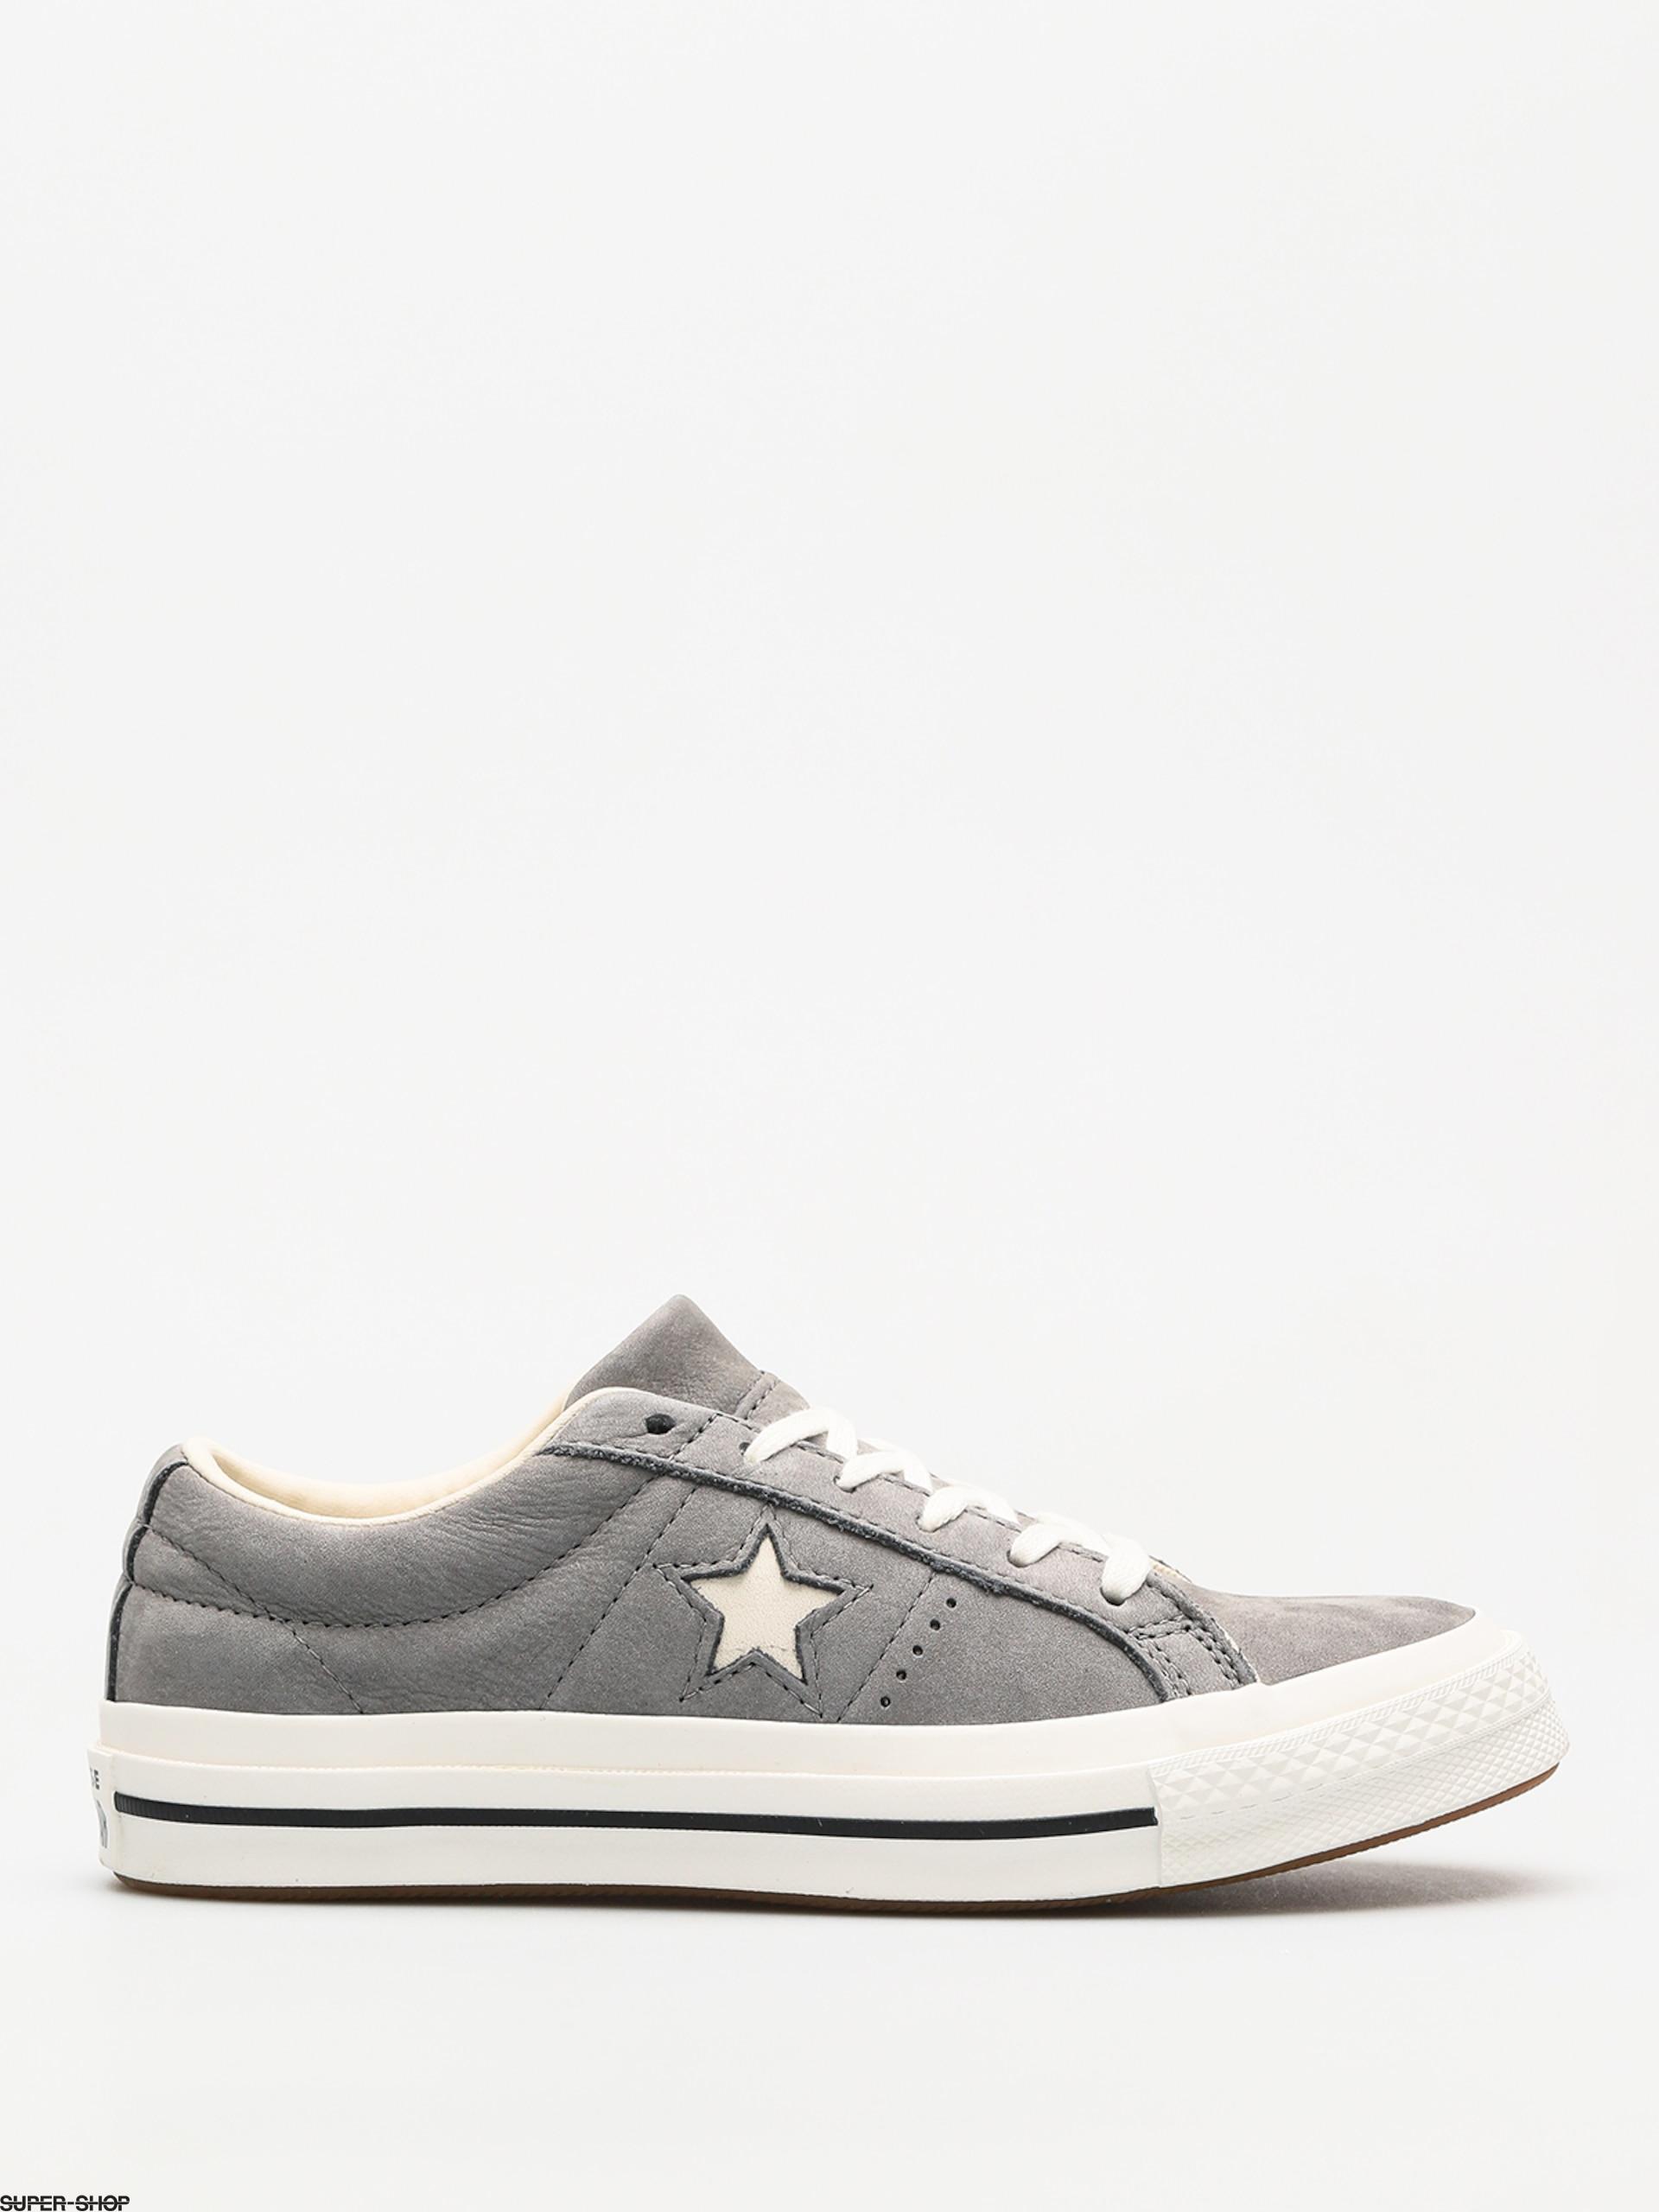 Converse Chucks One Star Ox (masonblackvintage white)